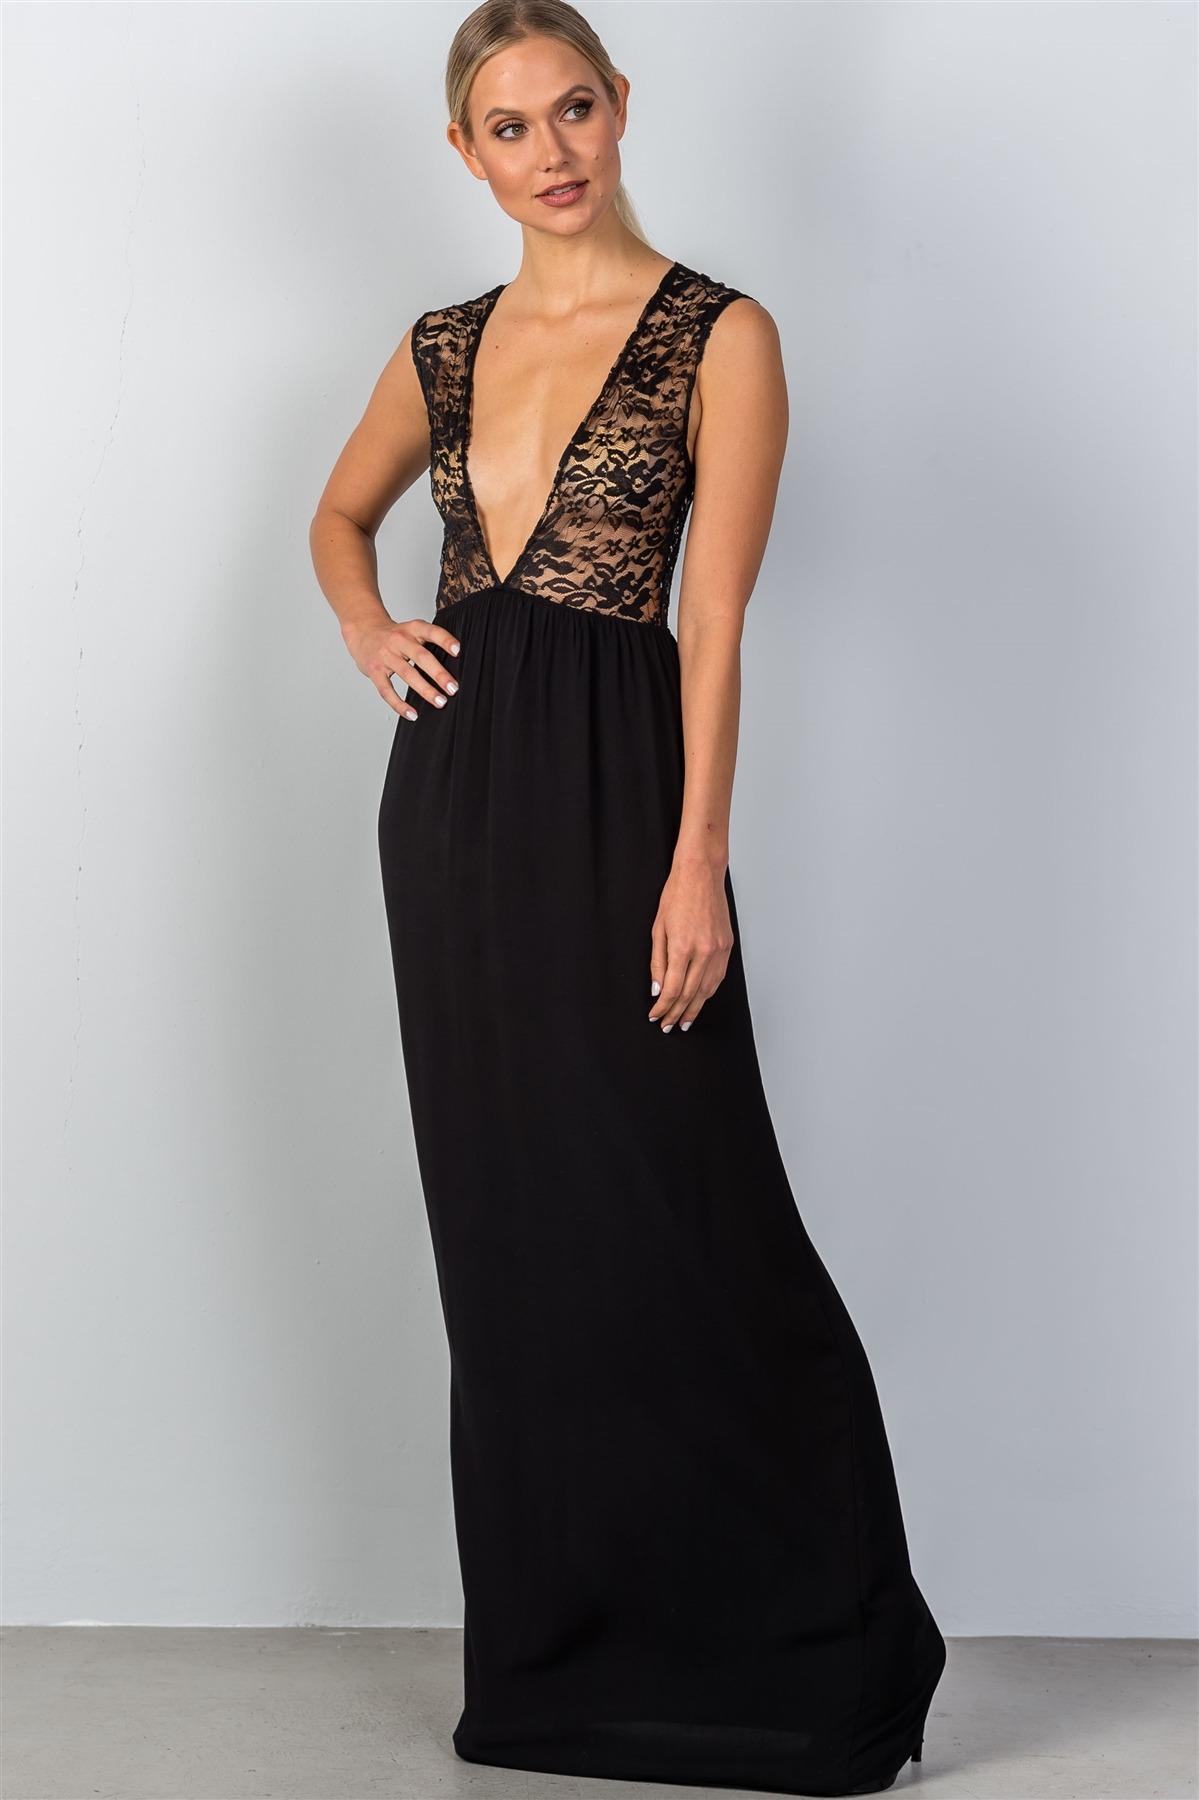 6409f9303b Ladies fashion sleeveless deep v plunge lace sheer top maxi dress-id.CC35167.  Black